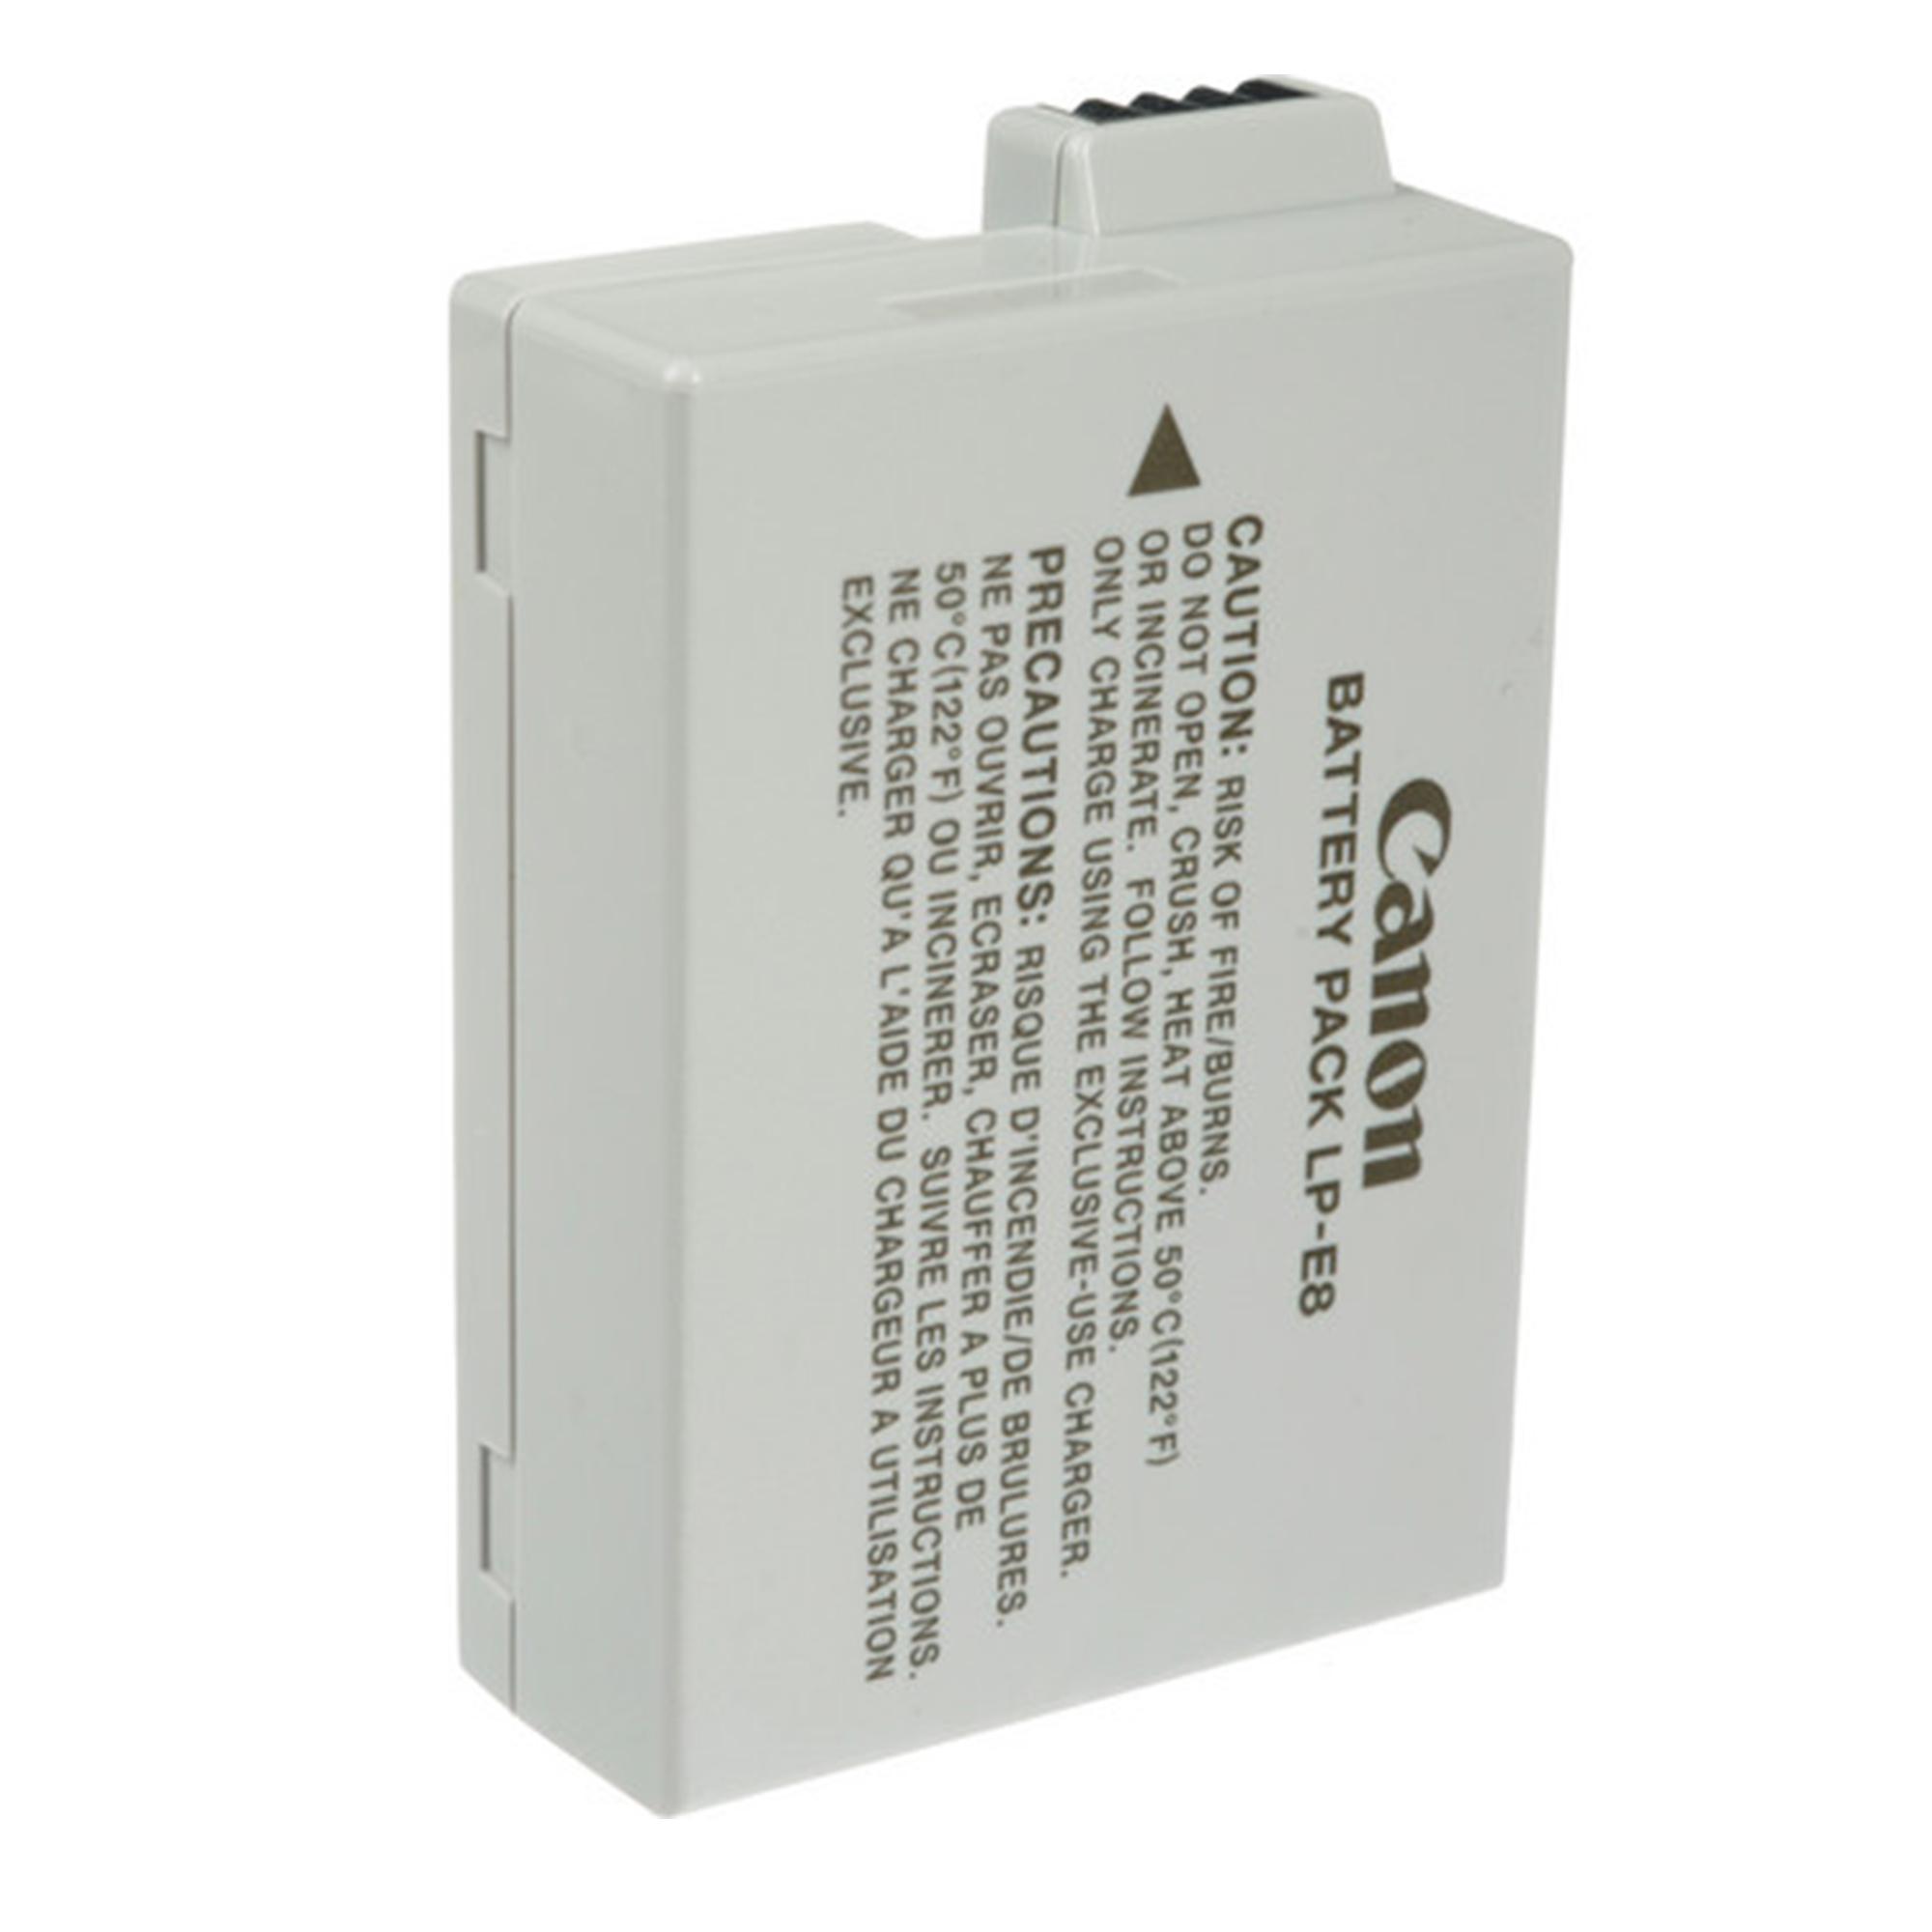 Canon LP-E8 Rechargeable Battery Pack